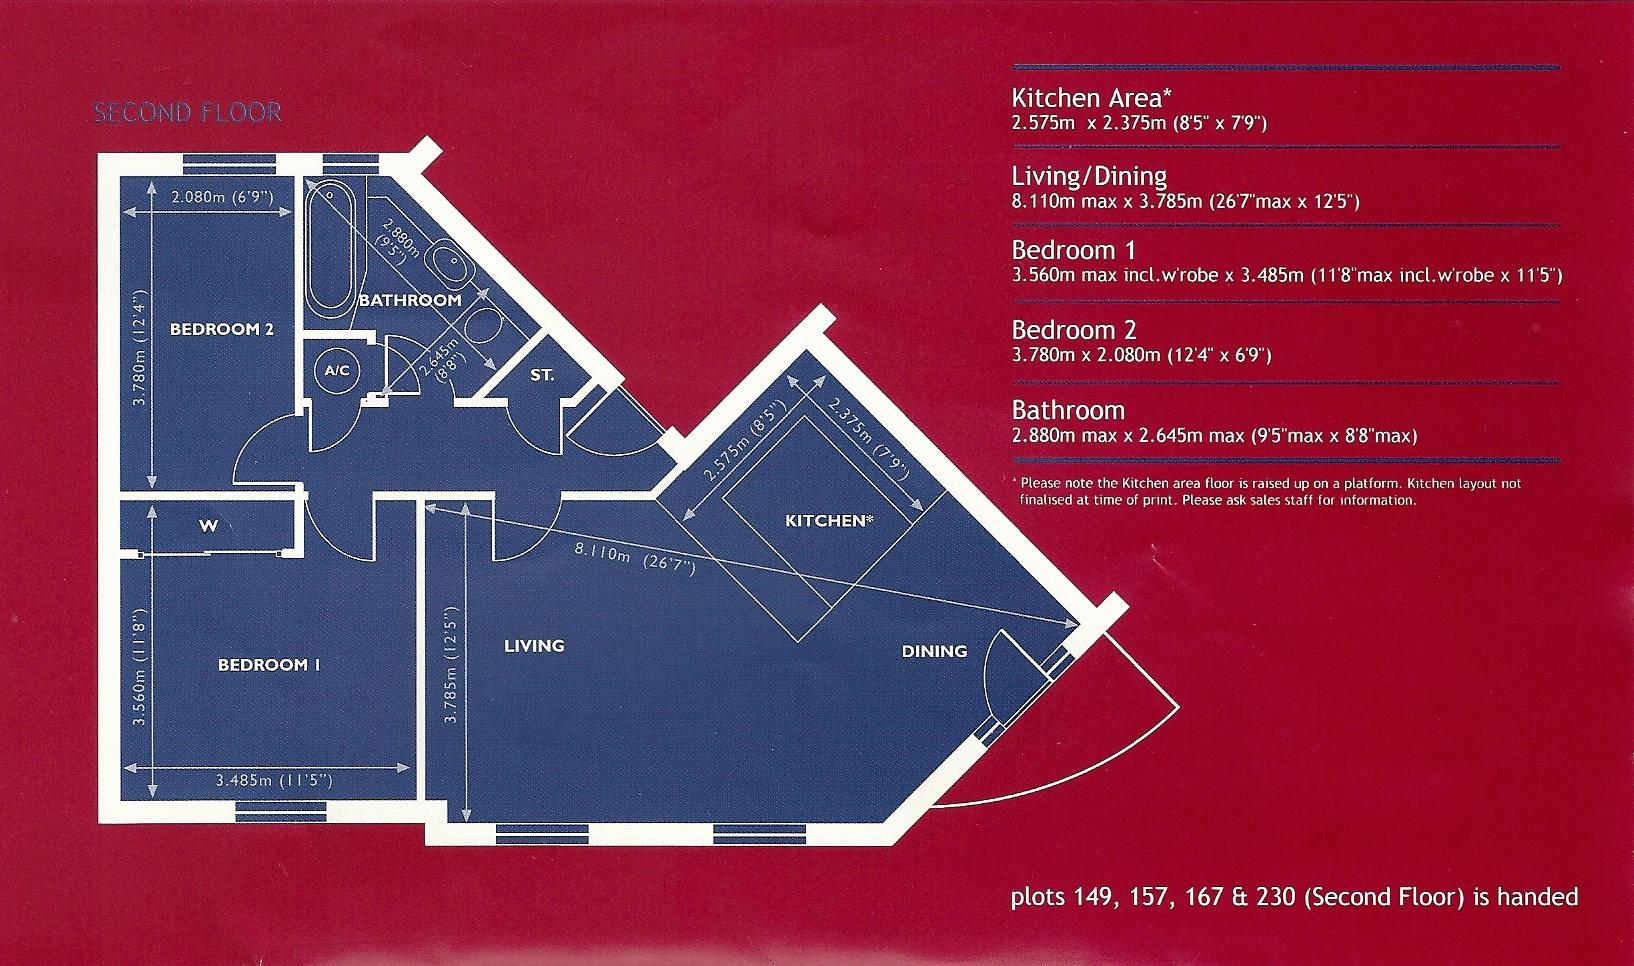 7 way navigation honda goldwing 1800 radio wiring diagram hockley birmingham b18 2 bedroom flat